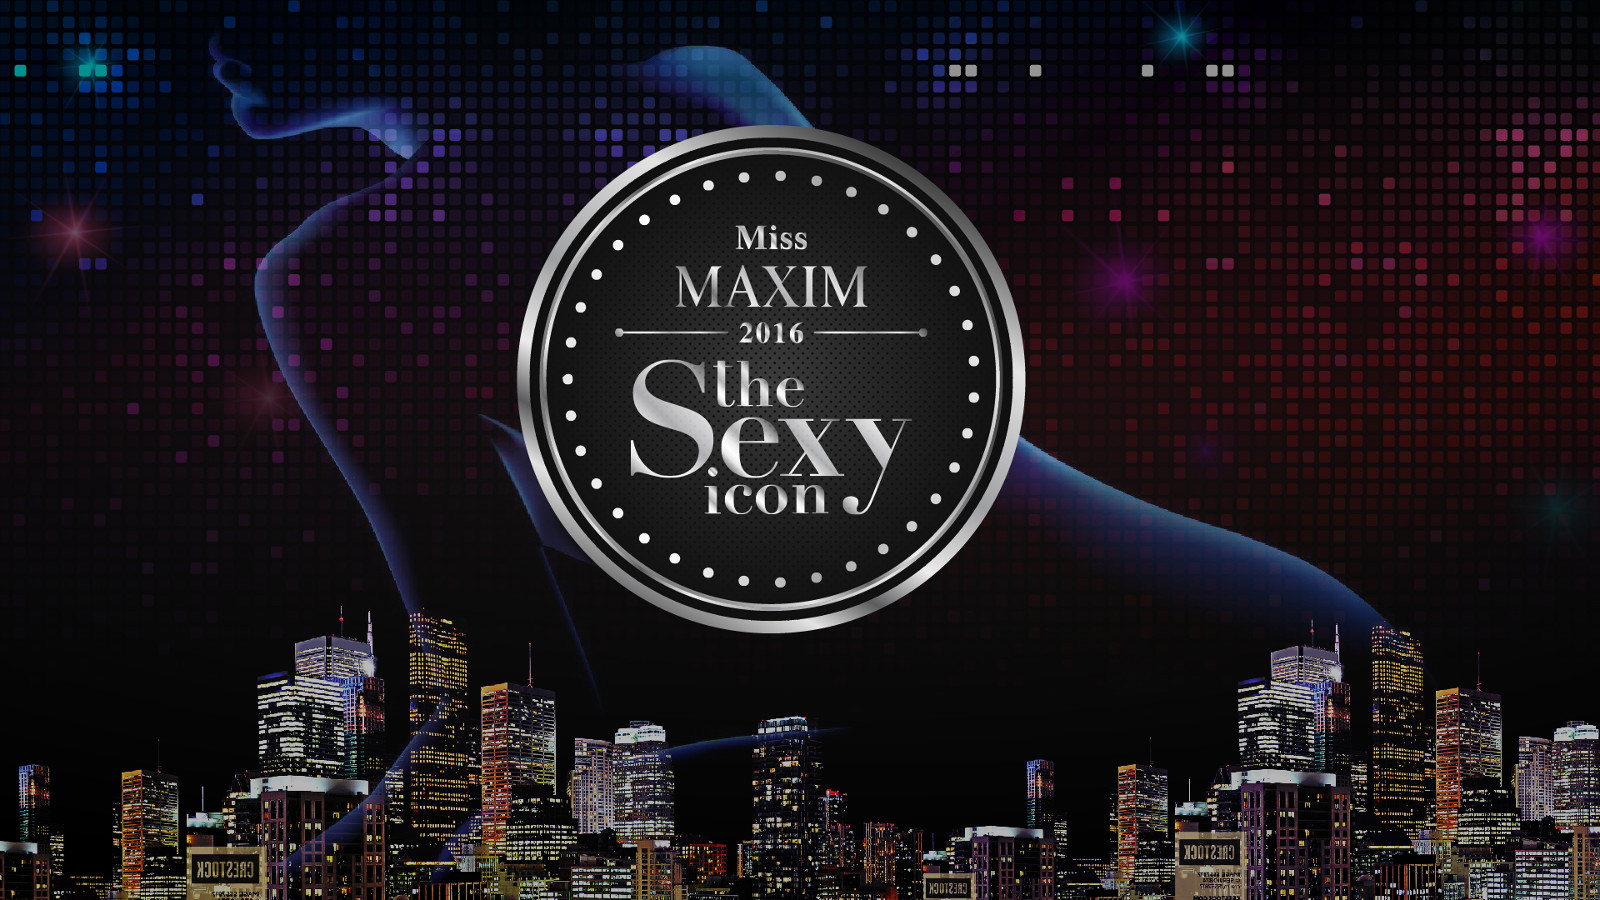 Miss MAXIM 2016 the Sexy Icon (MX121-MX130)